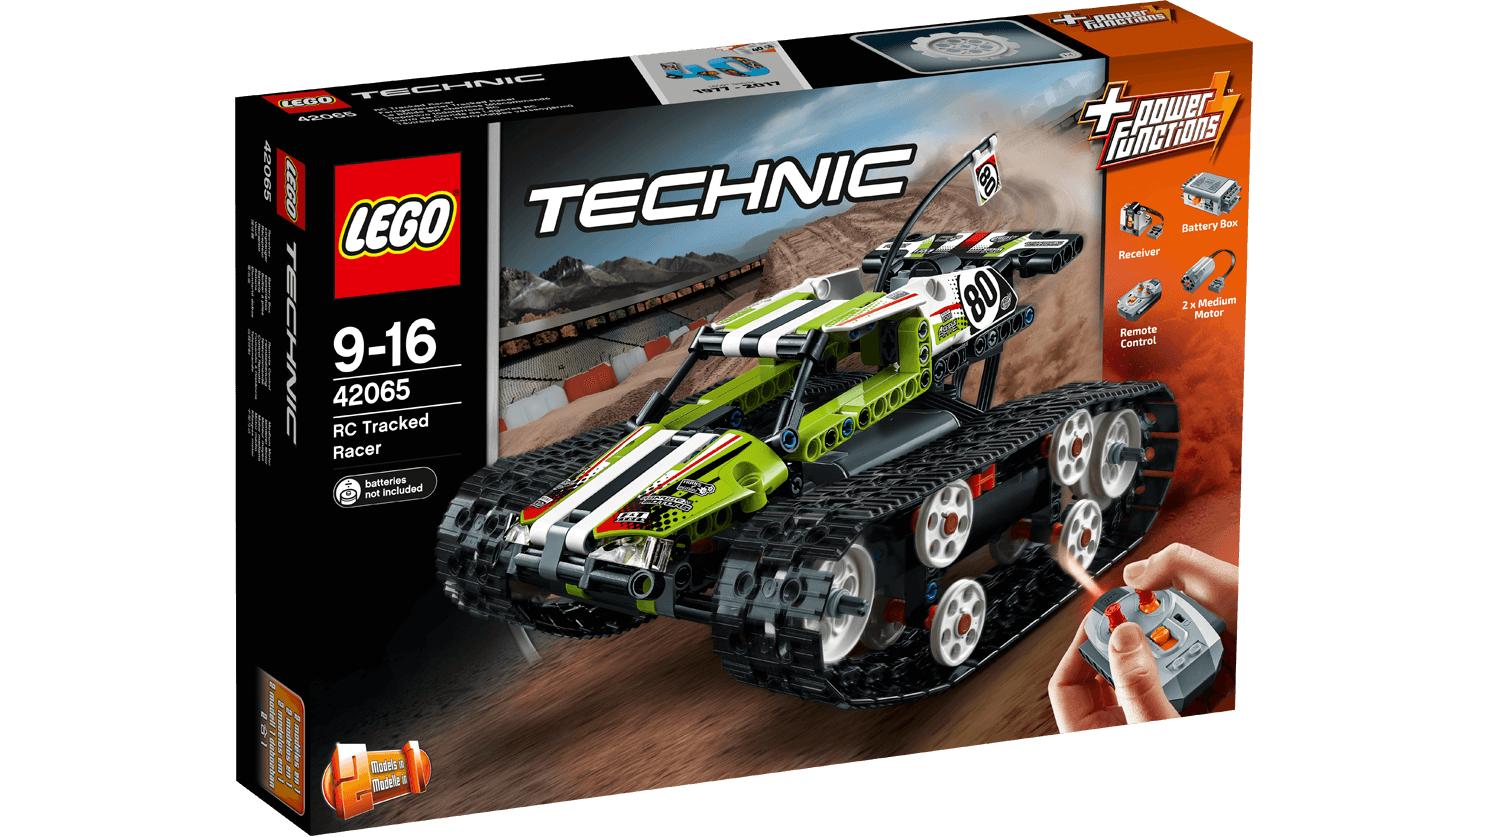 Lego Technic 42065 ferngesteuerter Tracked Racer [Amazon prime]